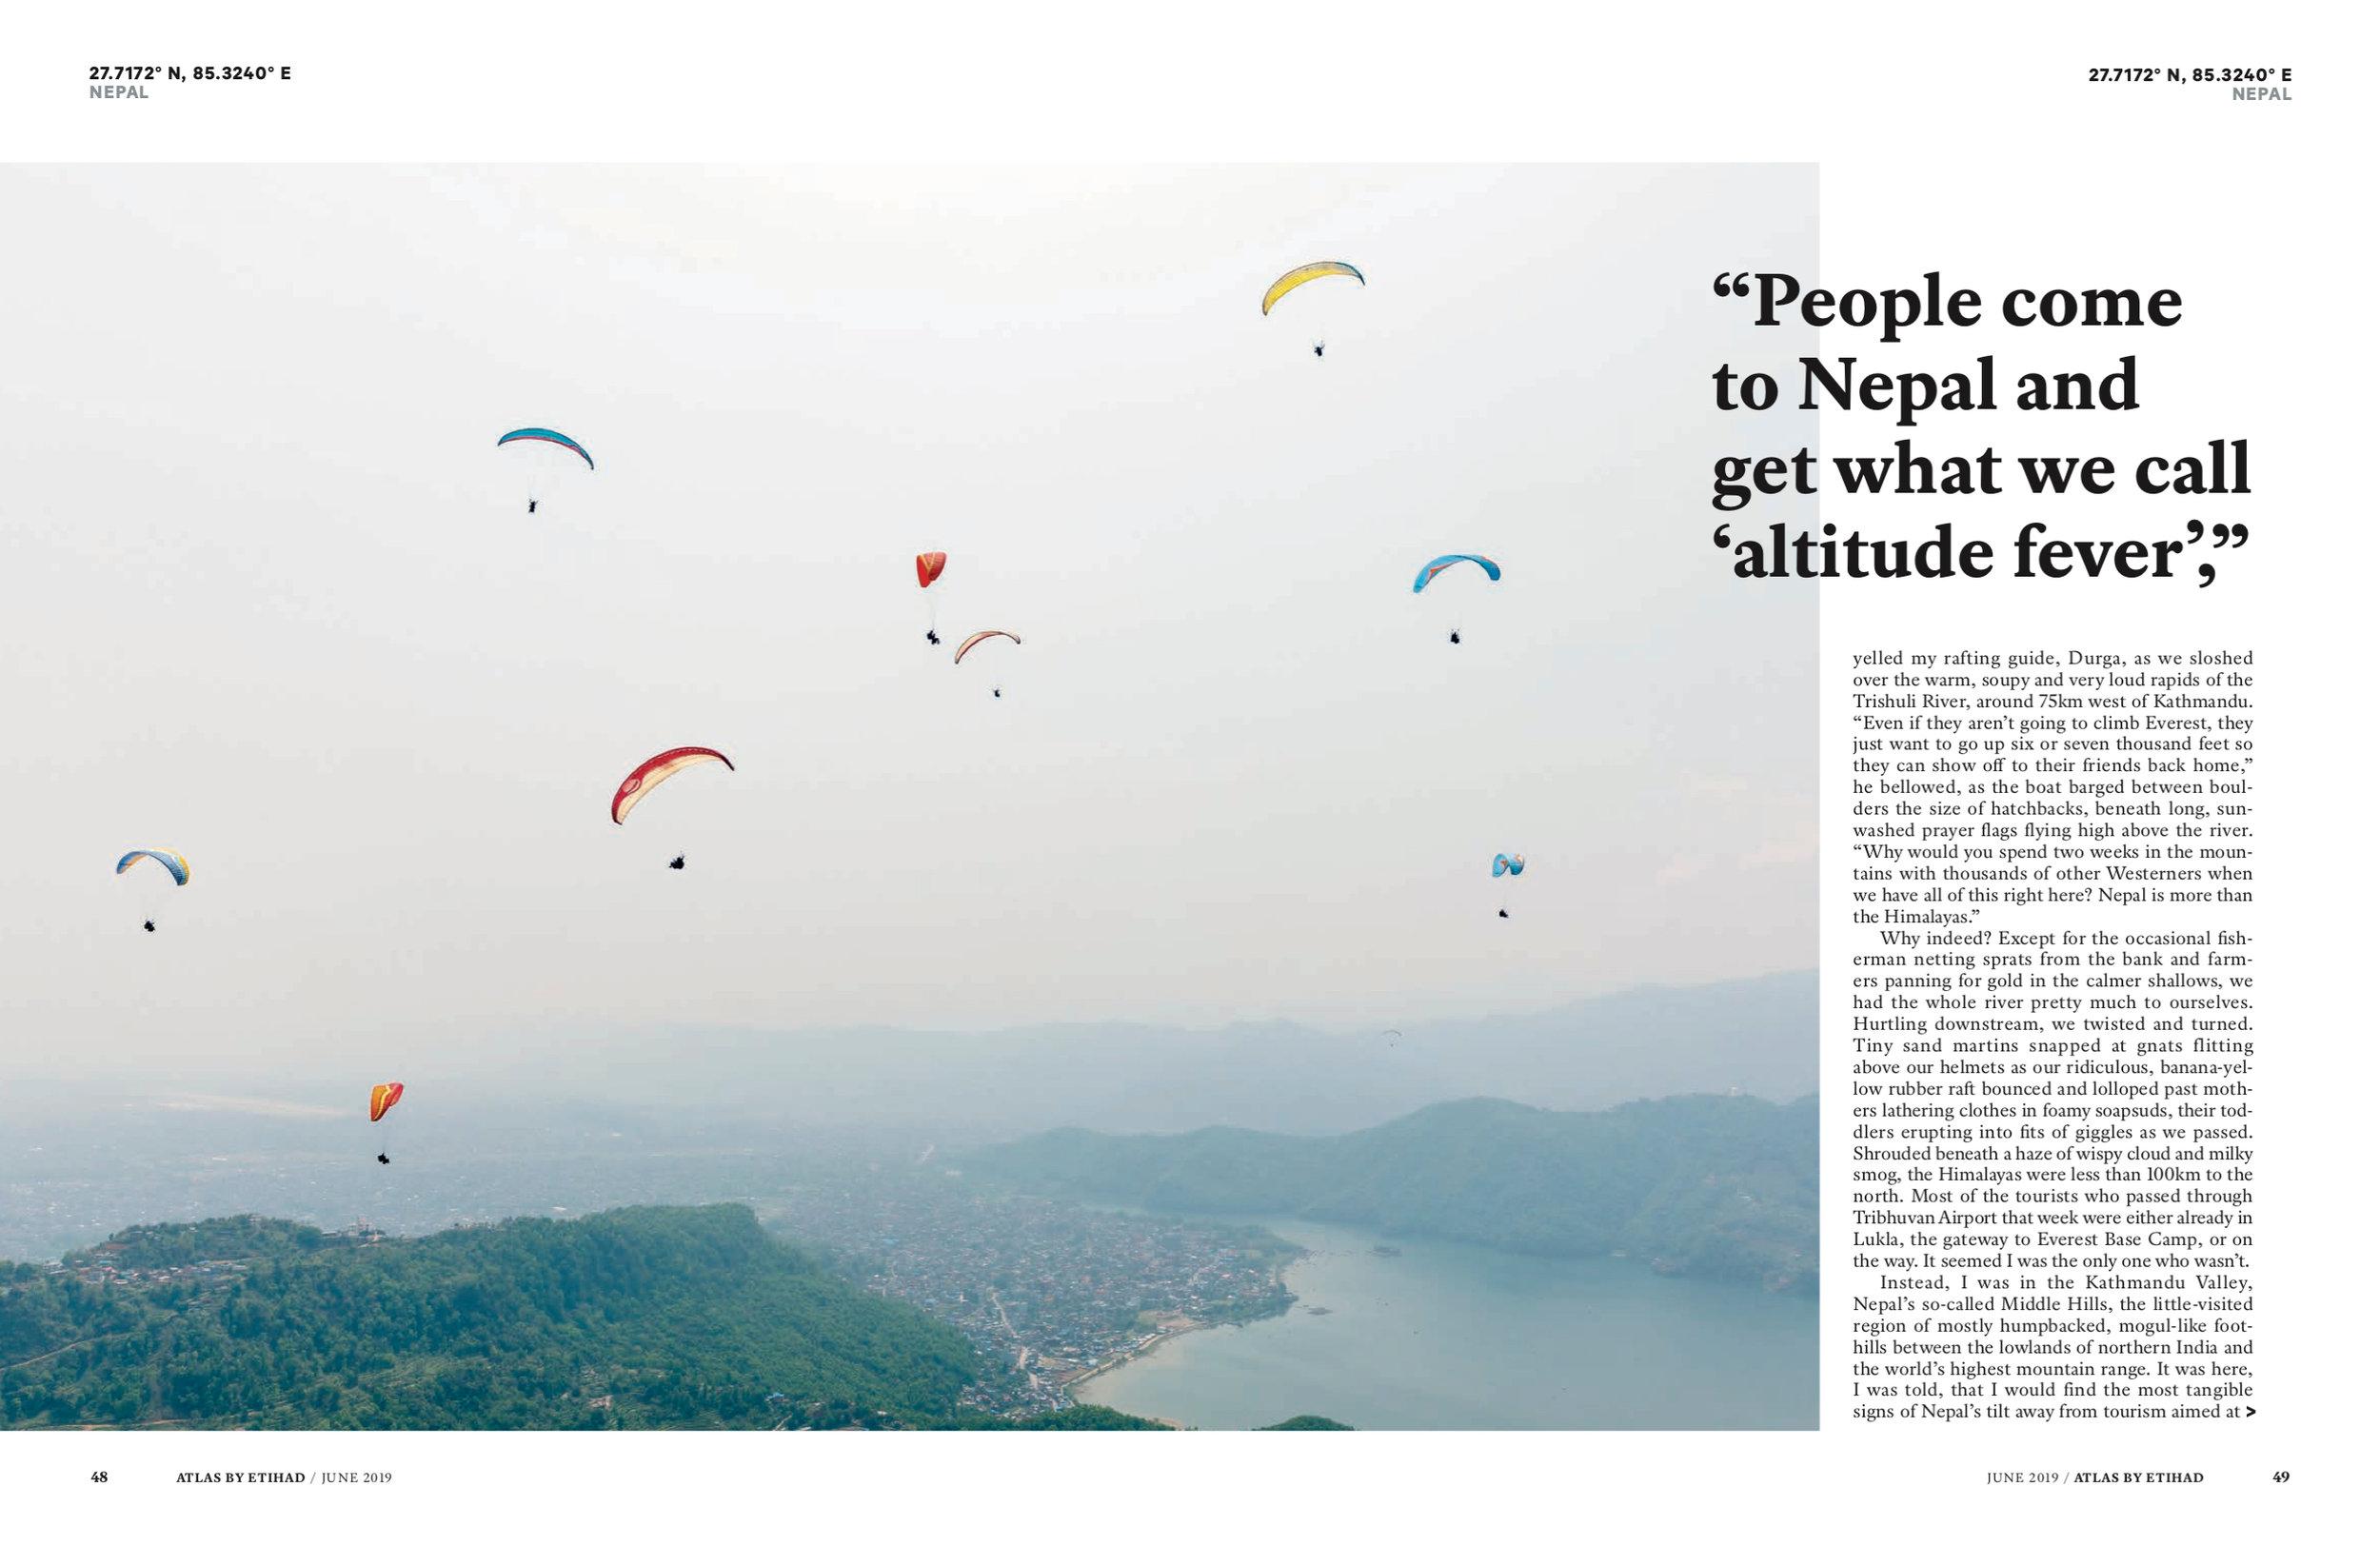 BenReadPhotography-Ink-Atlas-Etihad-Nepal-3.JPG